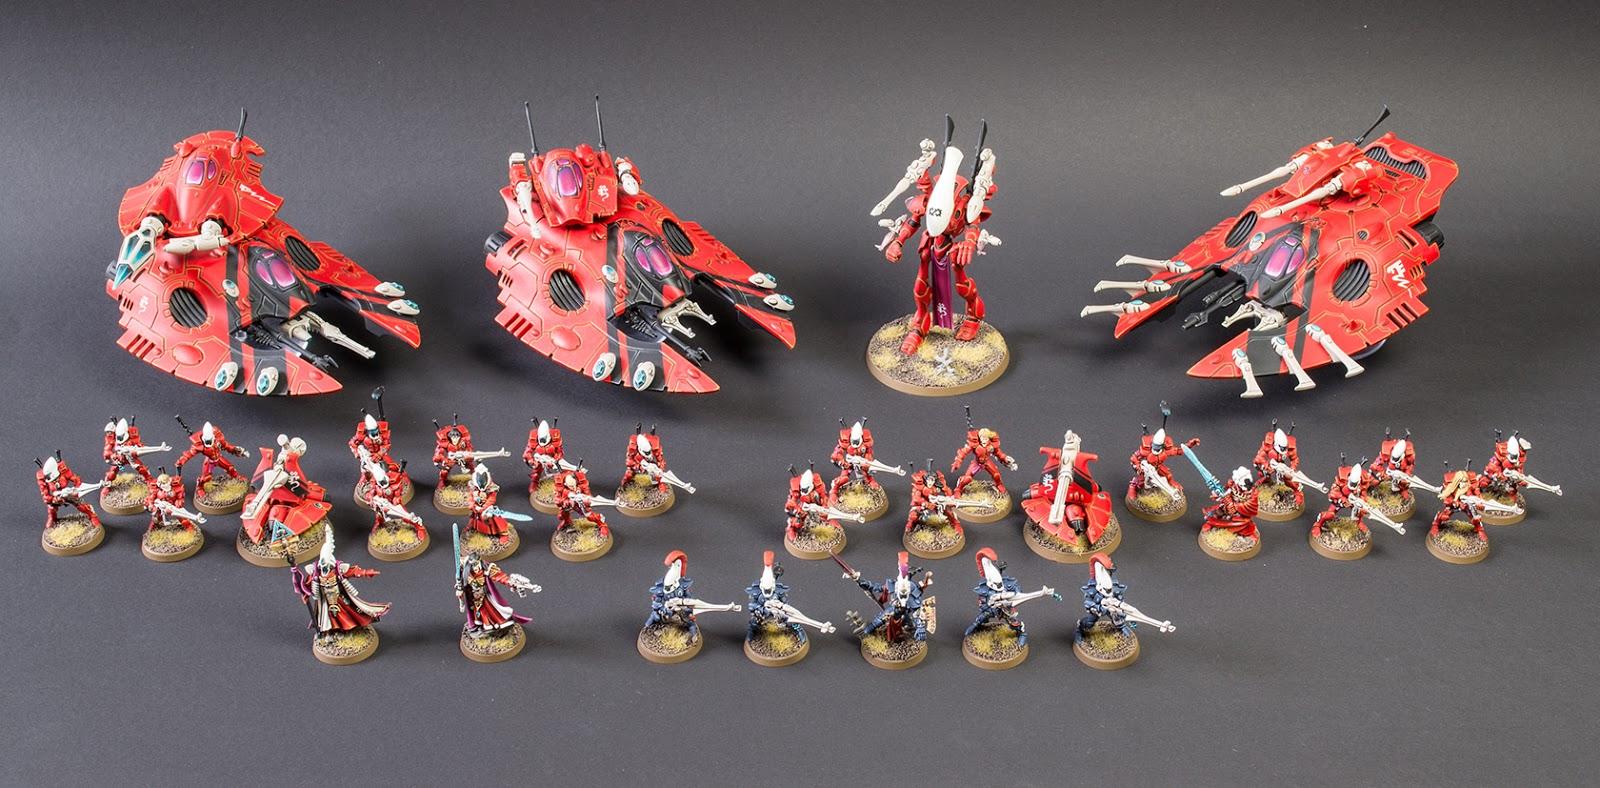 For sale stahlys saim hann eldar army tale of painters for sale stahlys saim hann eldar army publicscrutiny Image collections